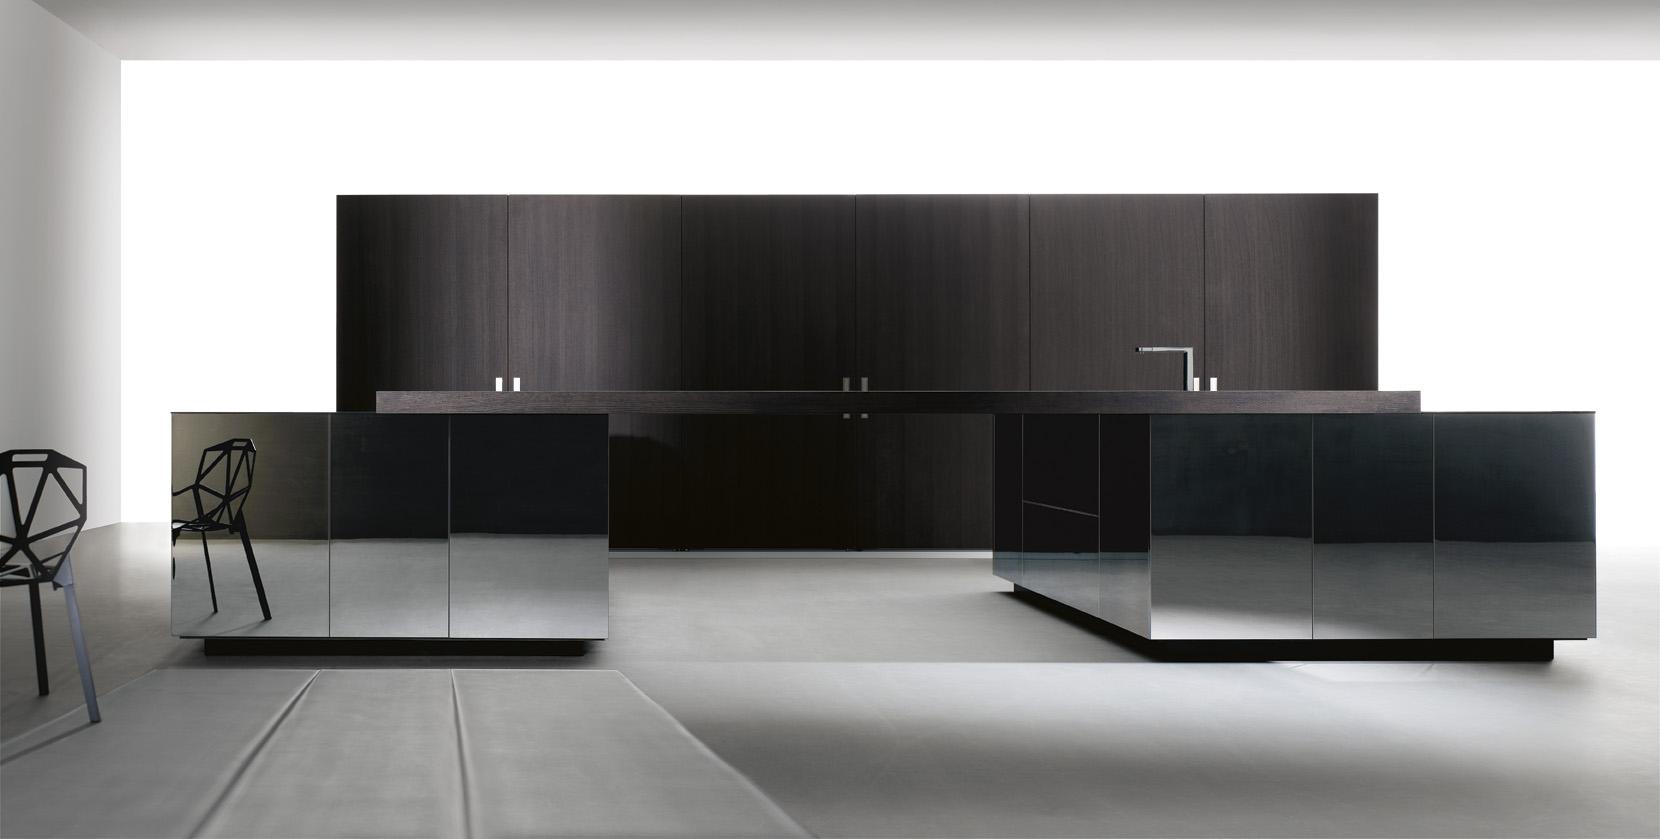 See gunni trentino kitchens archivos - Gunni y trentino madrid ...